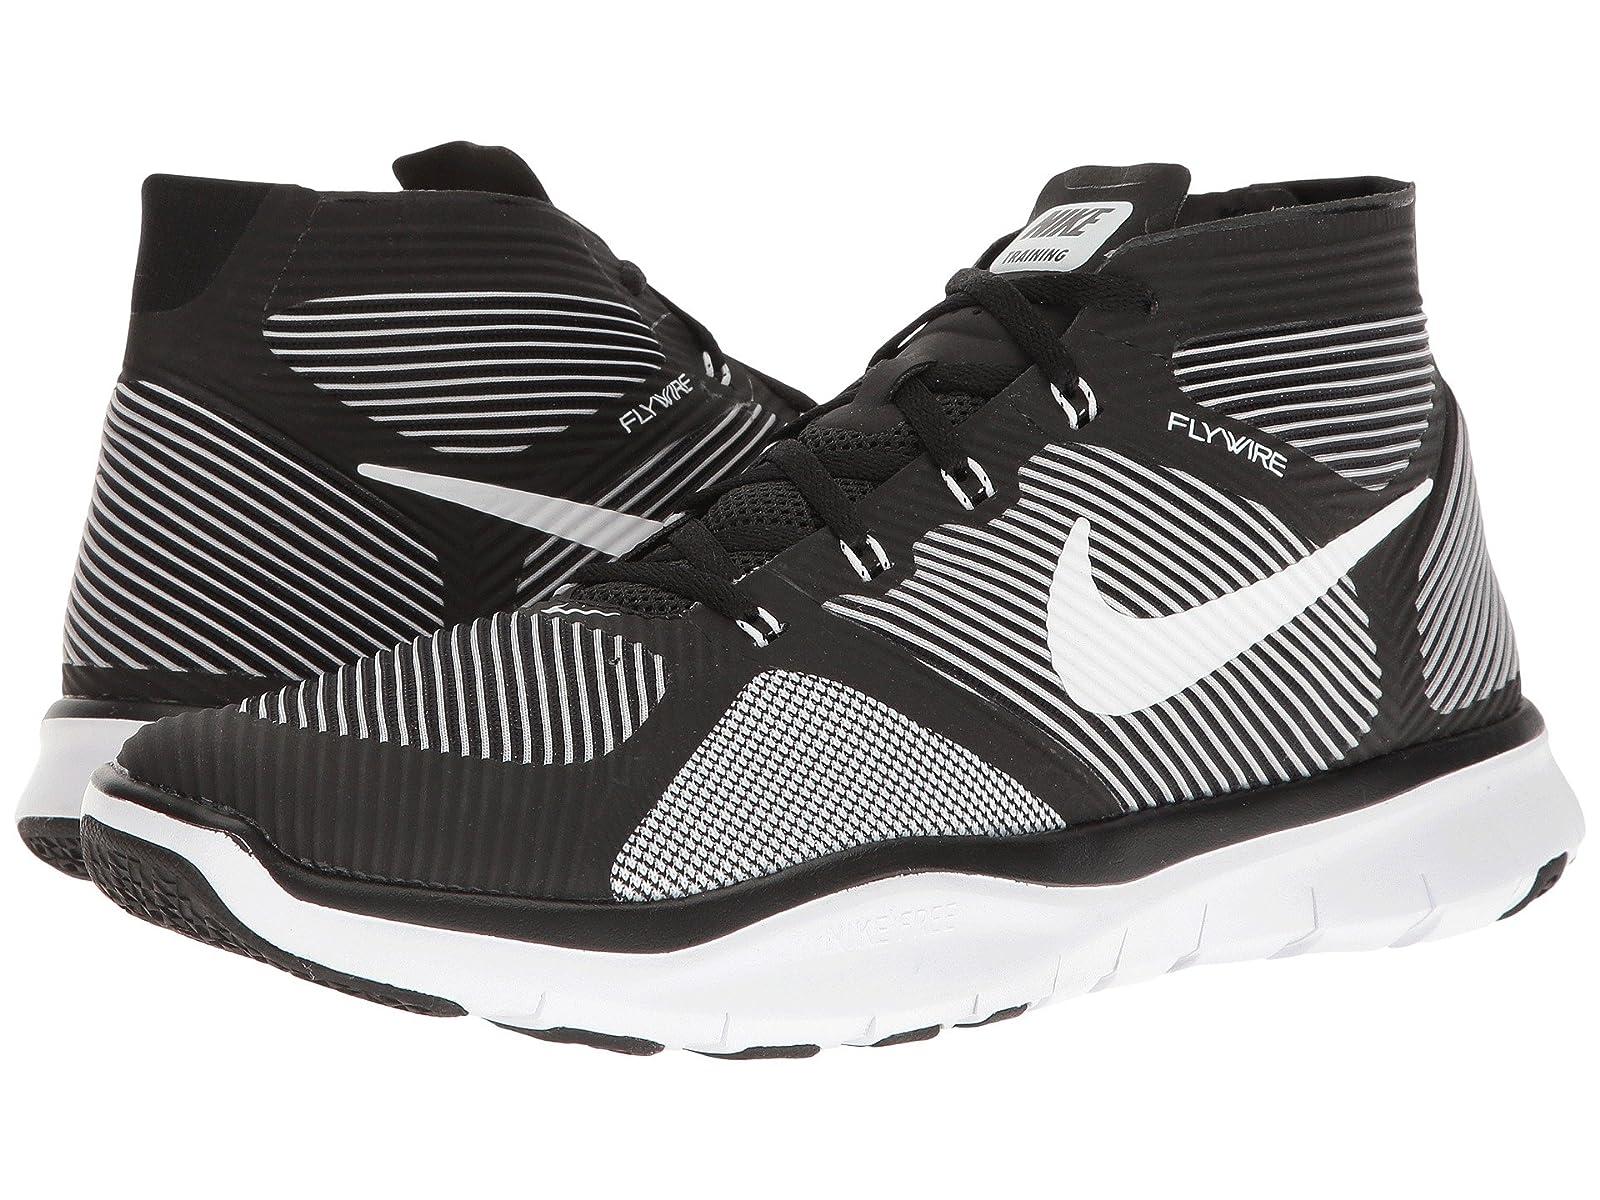 Nike Free Train InstinctCheap and distinctive eye-catching shoes